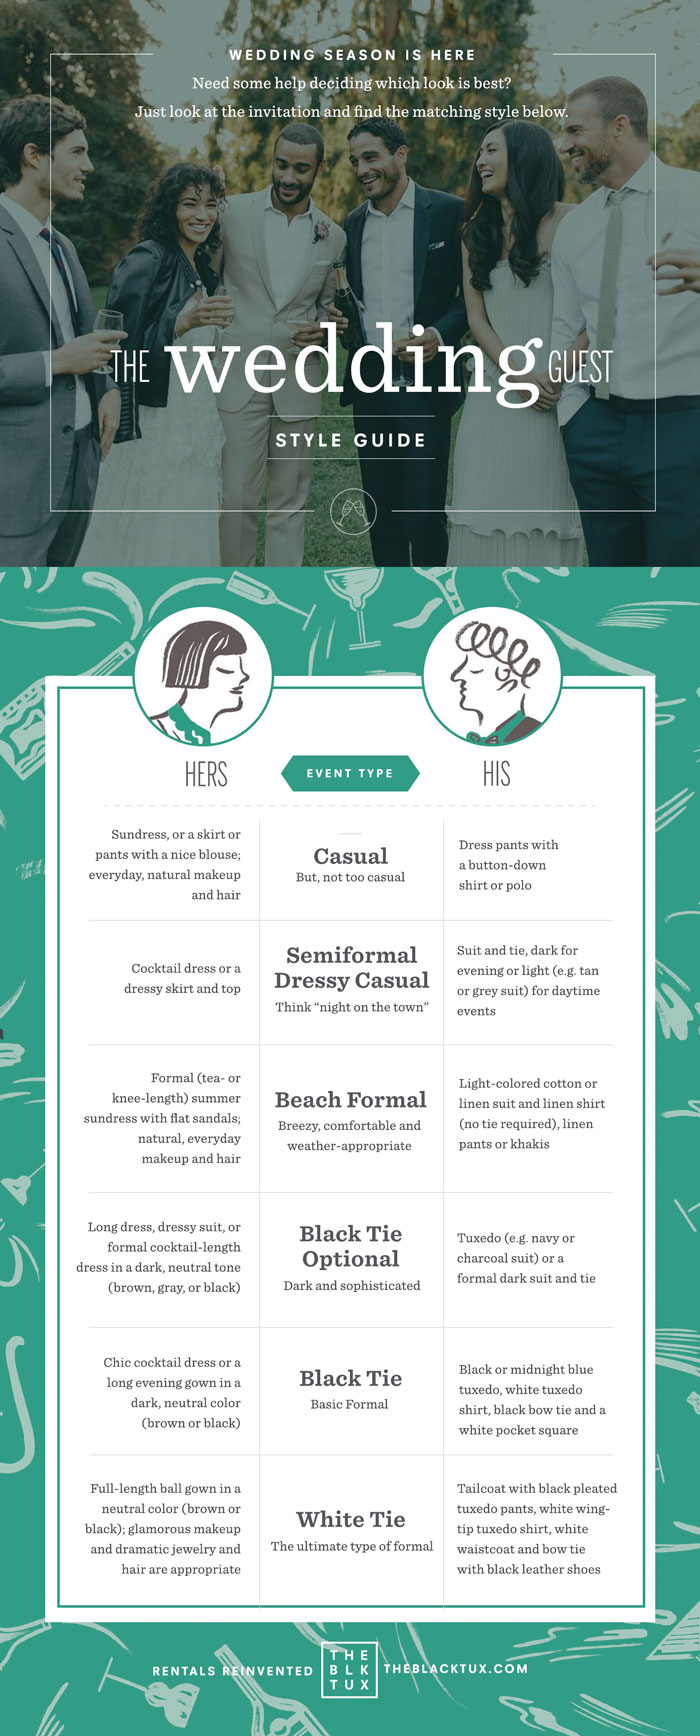 The Gentleman's Guide To Wedding Attire, Weddings, Wedding Attire, Men's Wedding wear